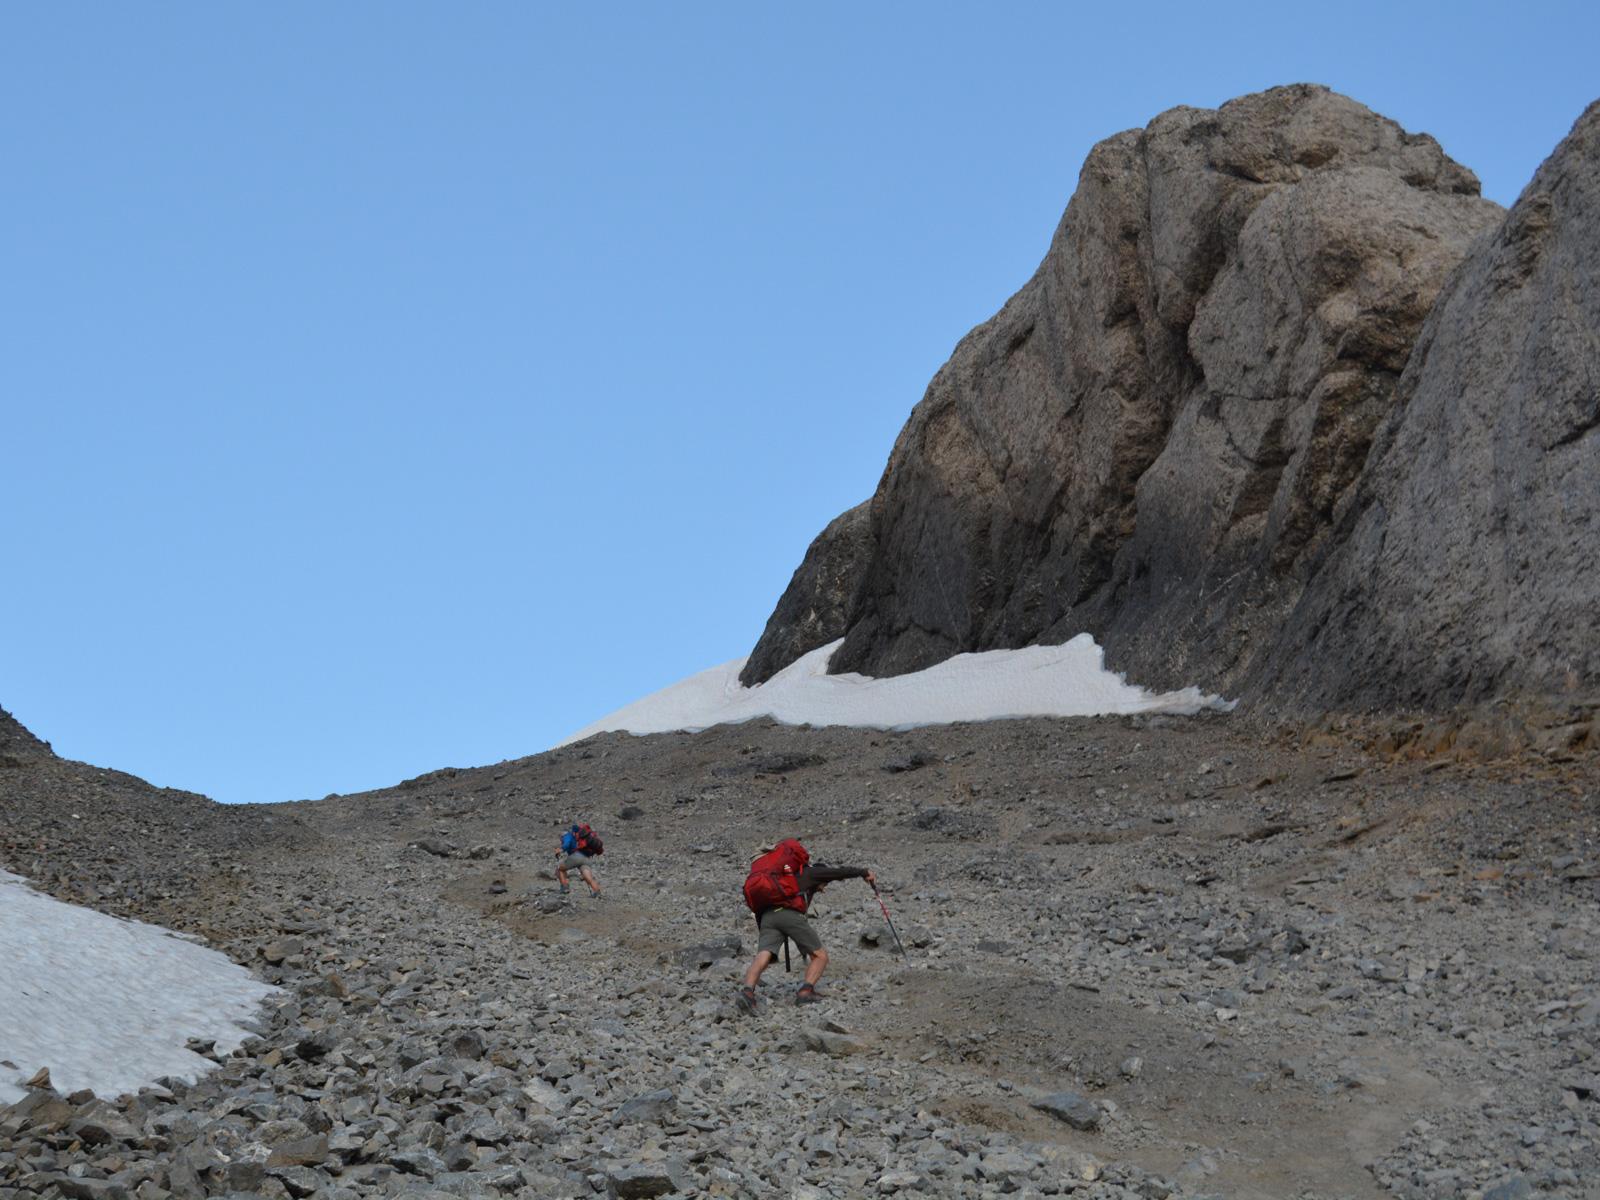 Monte Perdido et Faja de las Flores, Jour 1, Ordesa, Aragon, Espagne 48